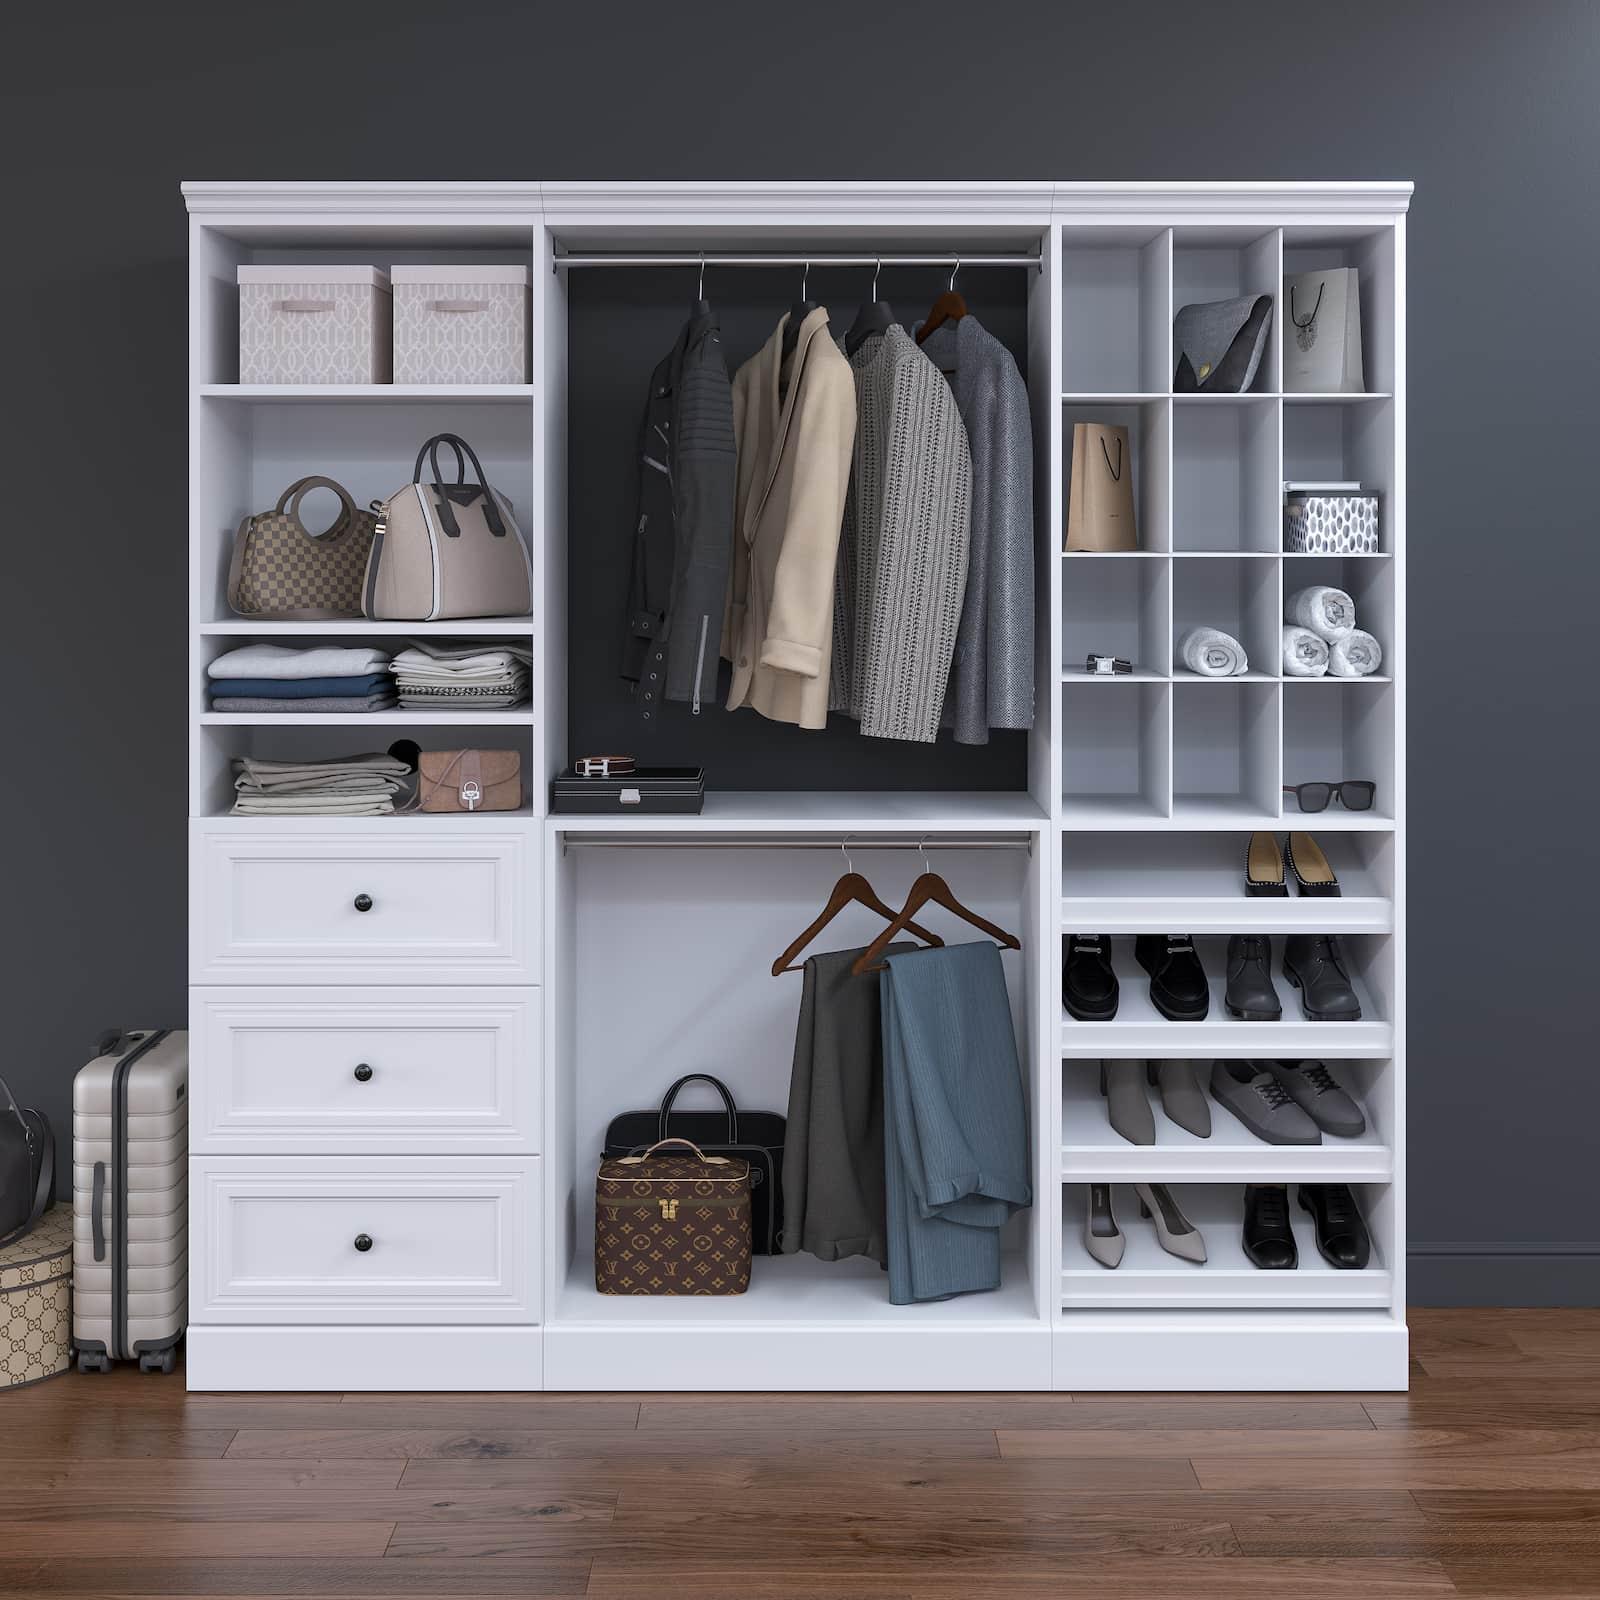 closet organizer in dark room with suitcase